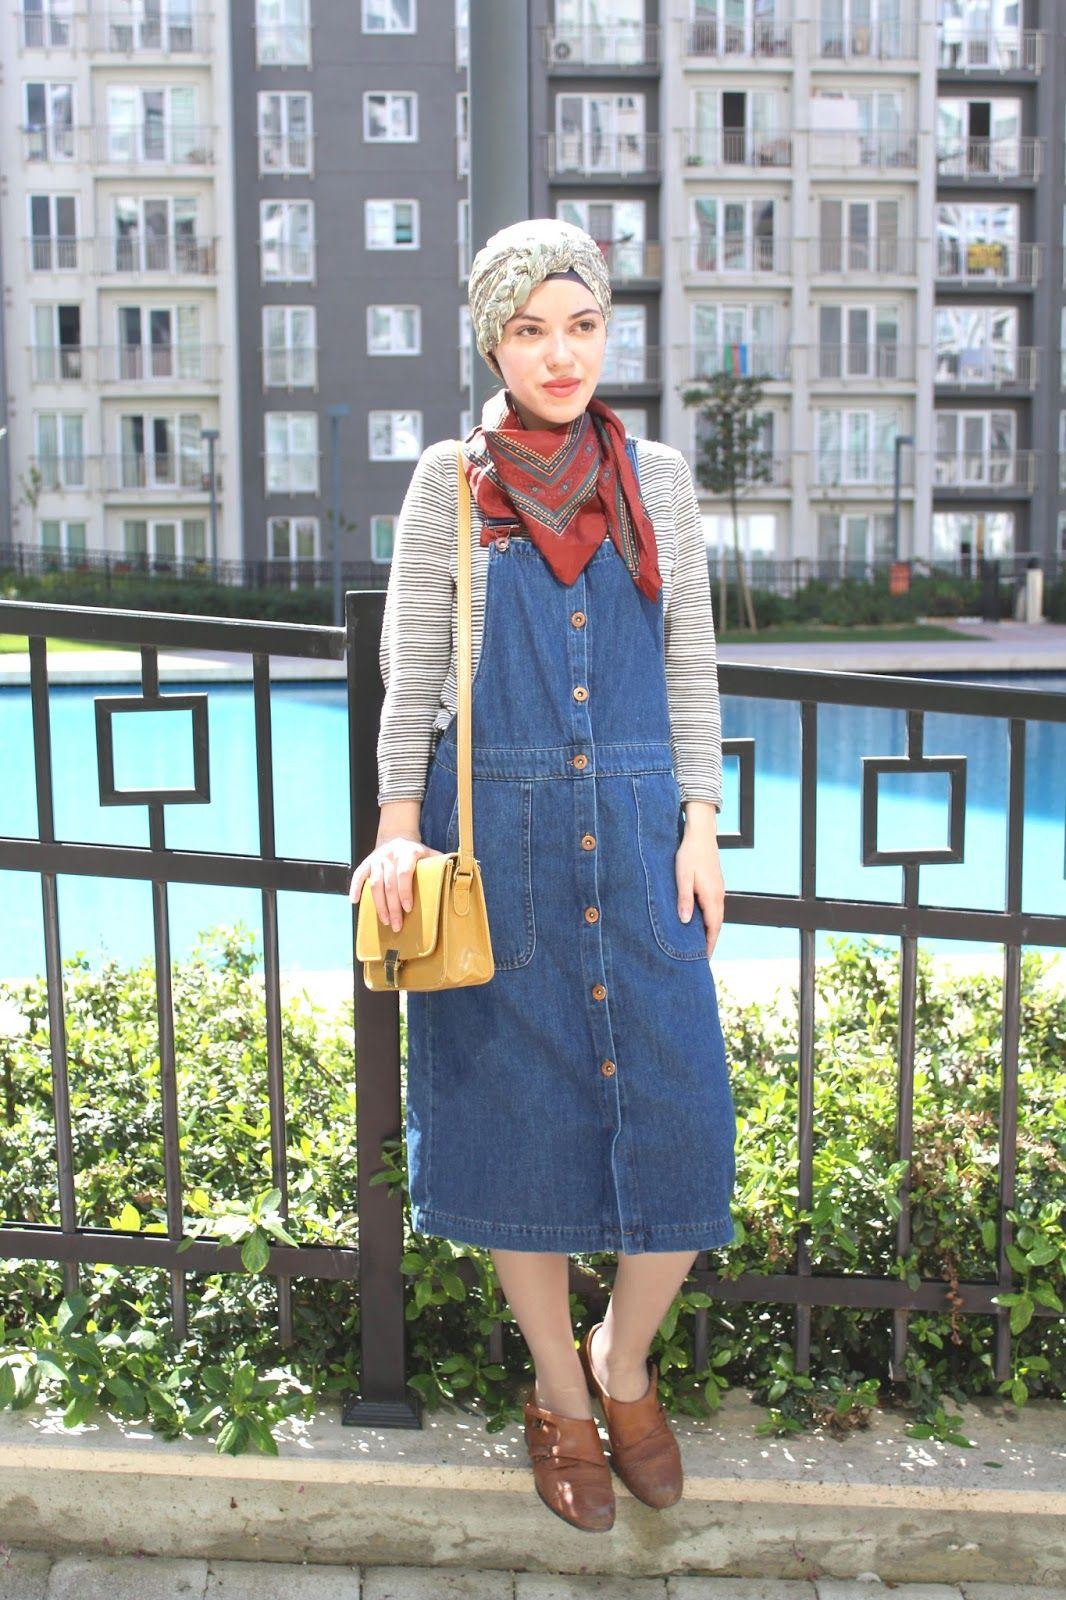 Vintagonista Denim Midi Dungarees Dress Mustard Satchel Brogues And Turban Hijab Folksy